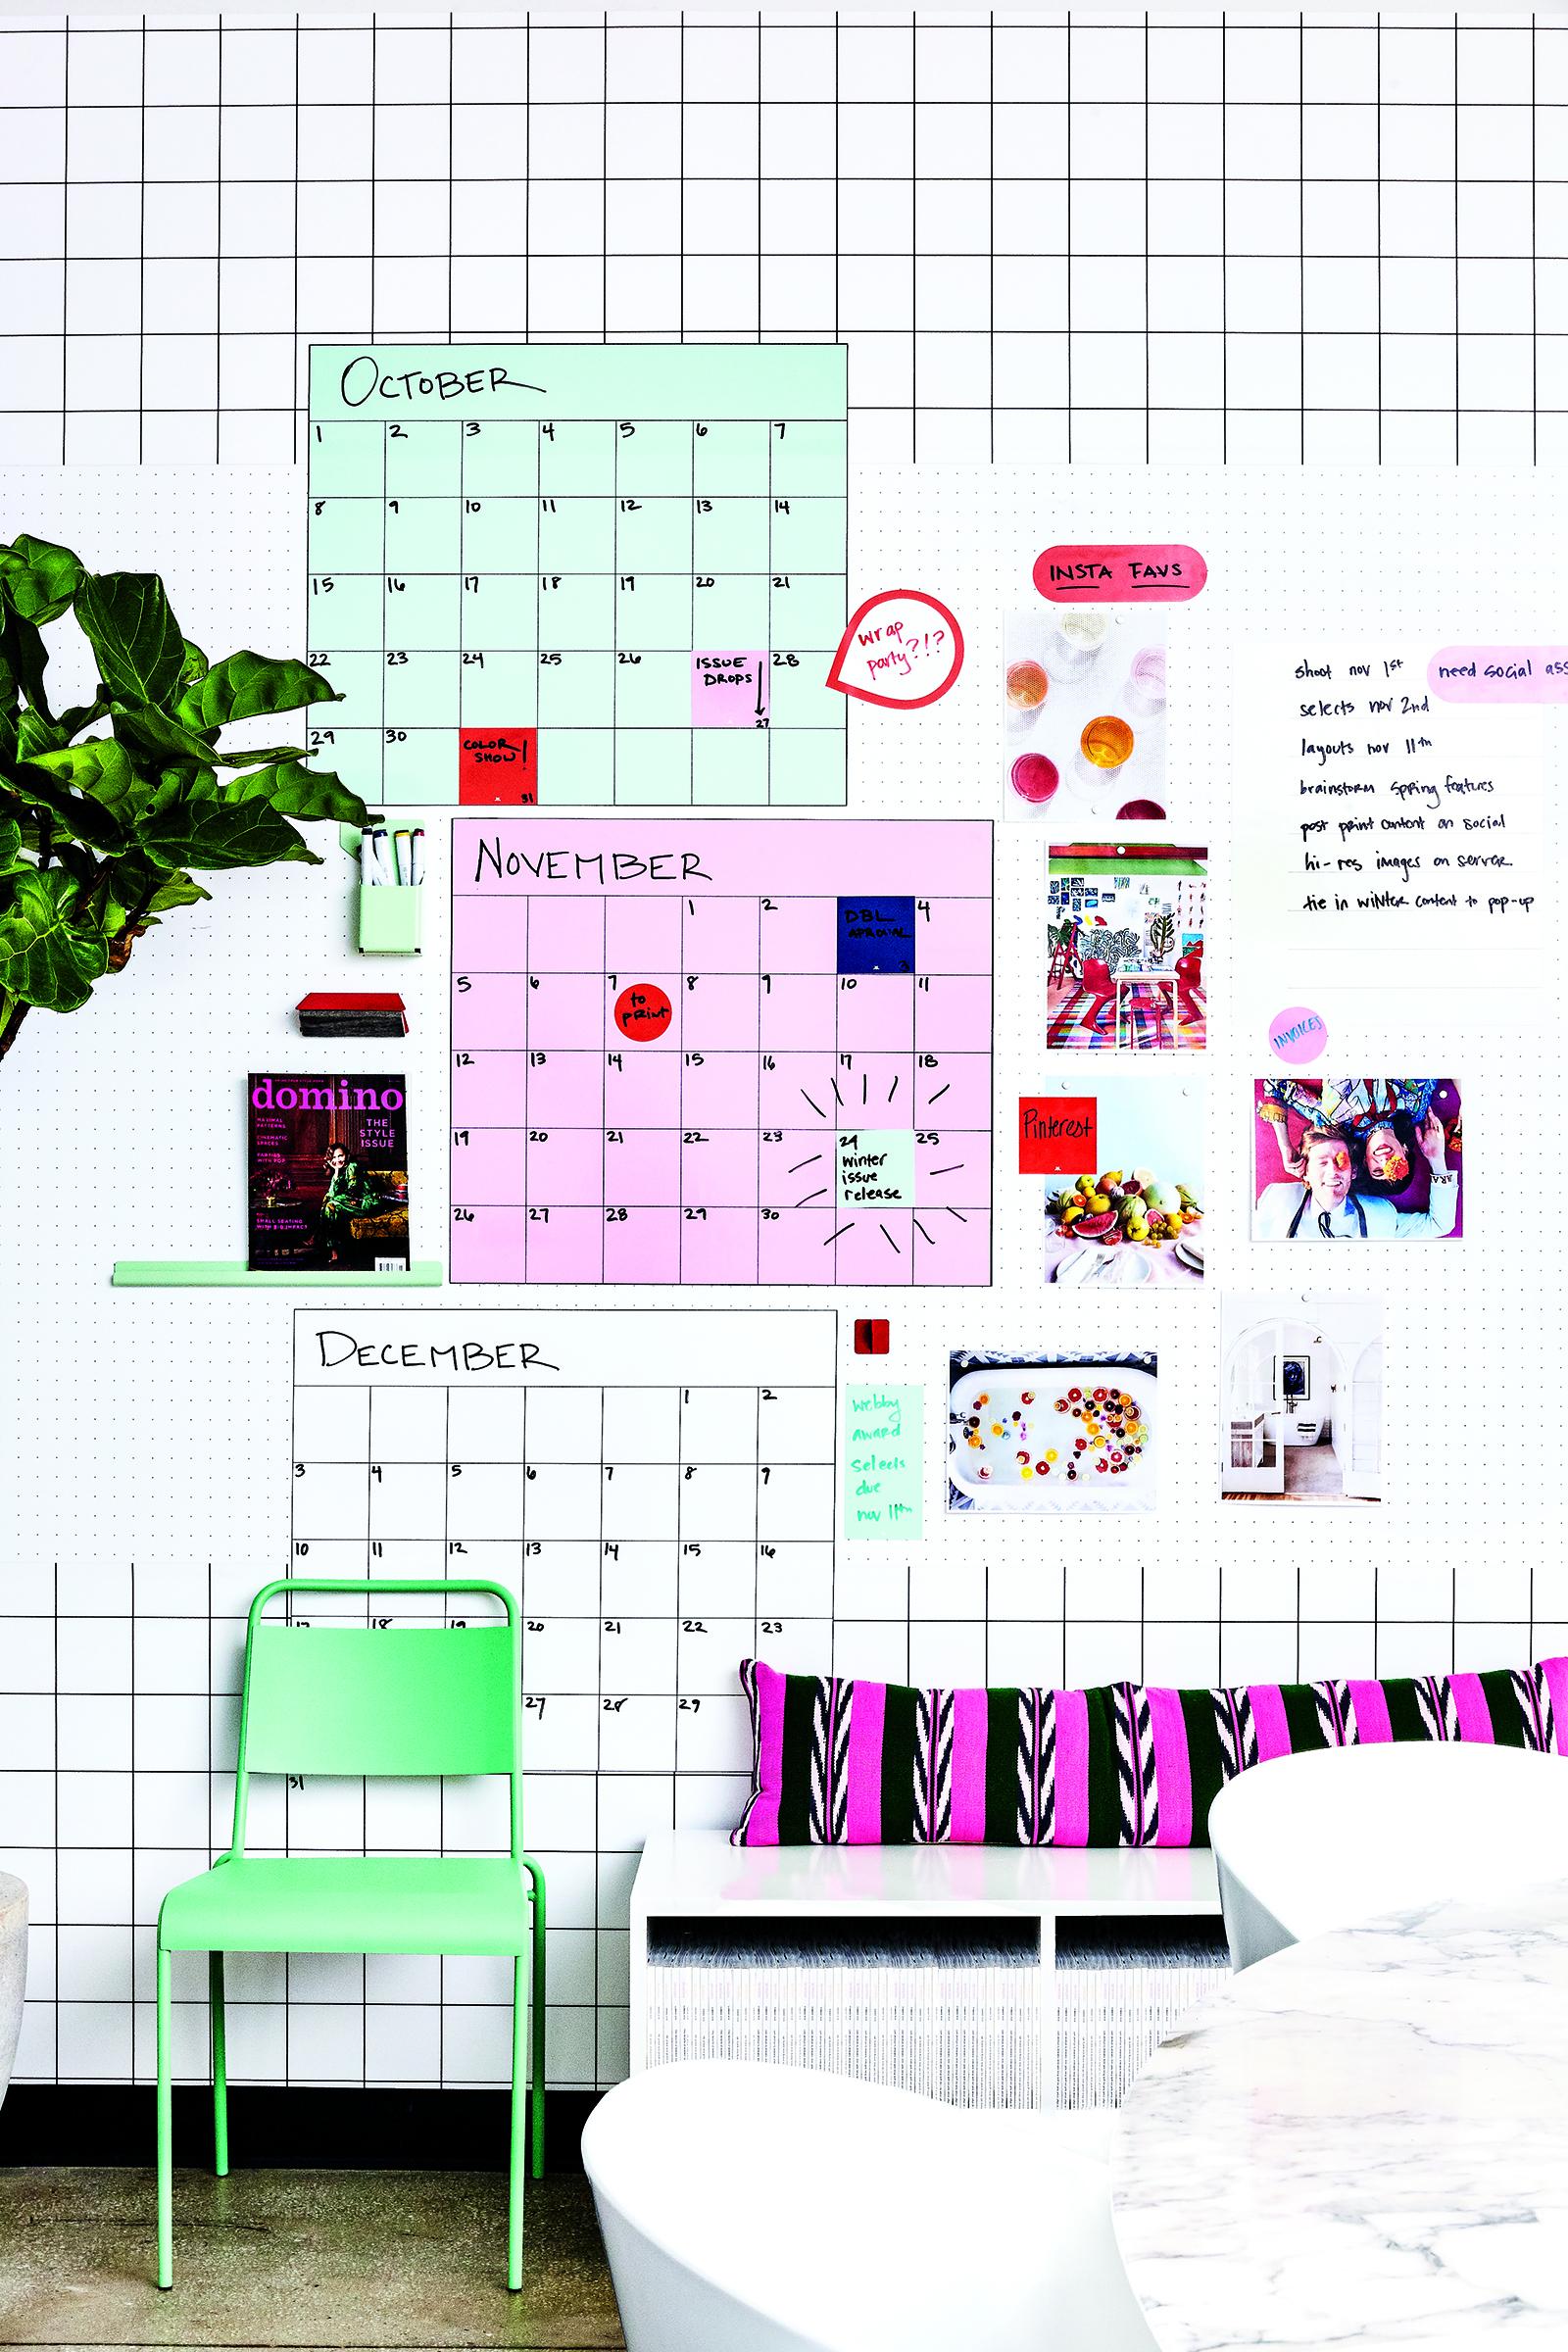 171024_DominioMagazine_Office0568.jpg